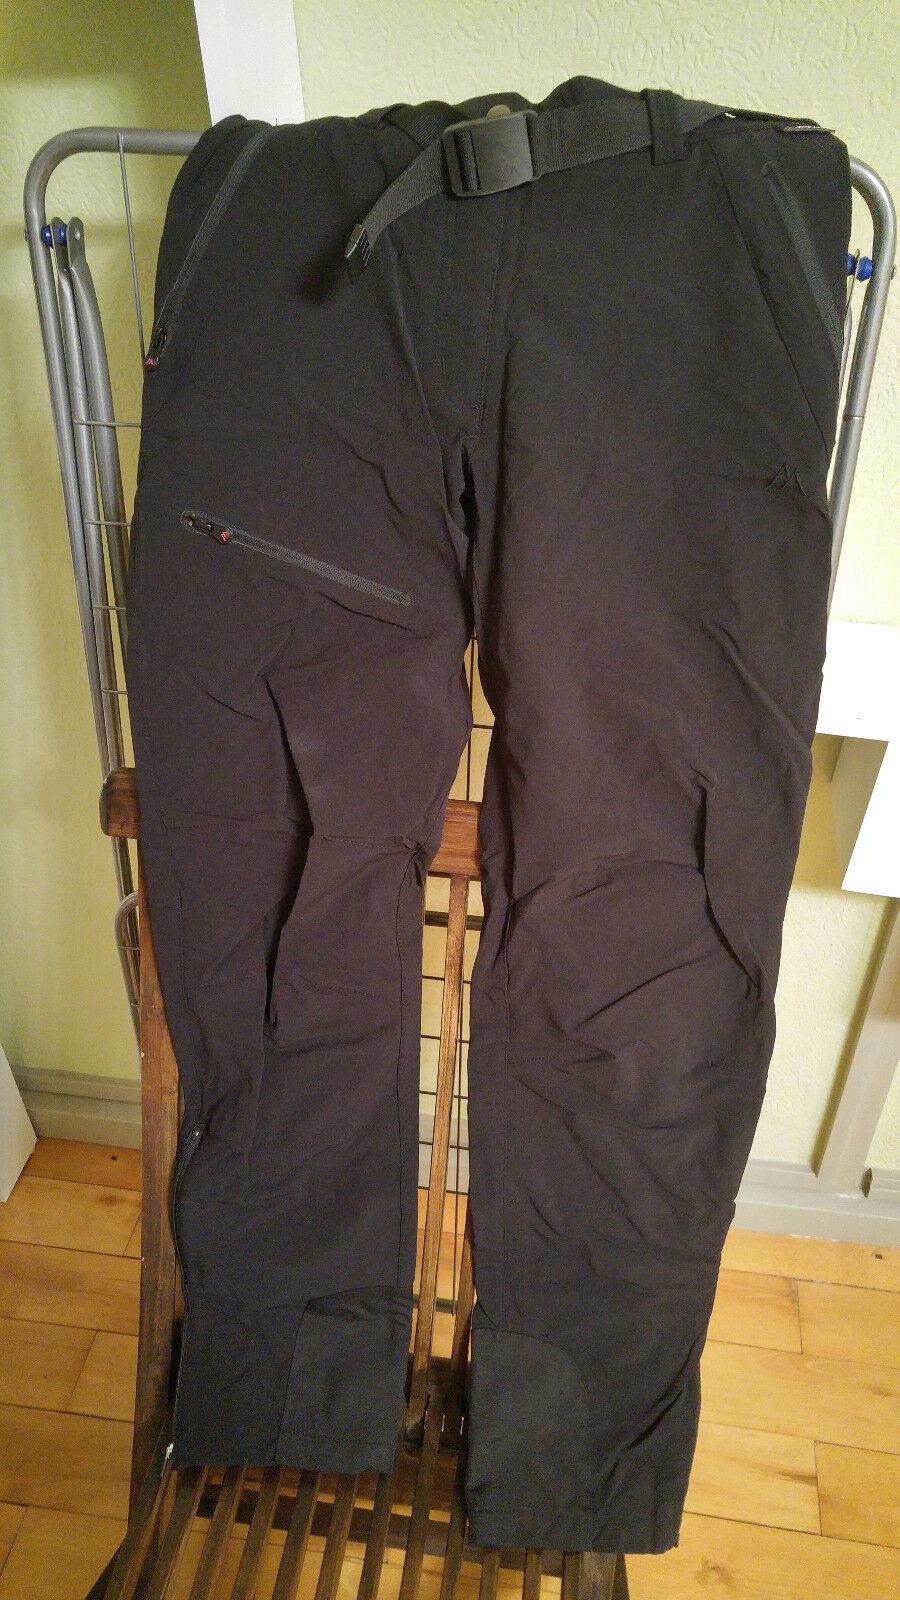 NEUW Maier Sports LANA Softshellhose Softshellhose Softshellhose - 38 - Outdoor Trekking Hose Pant NP 99 EUR 6ed46d